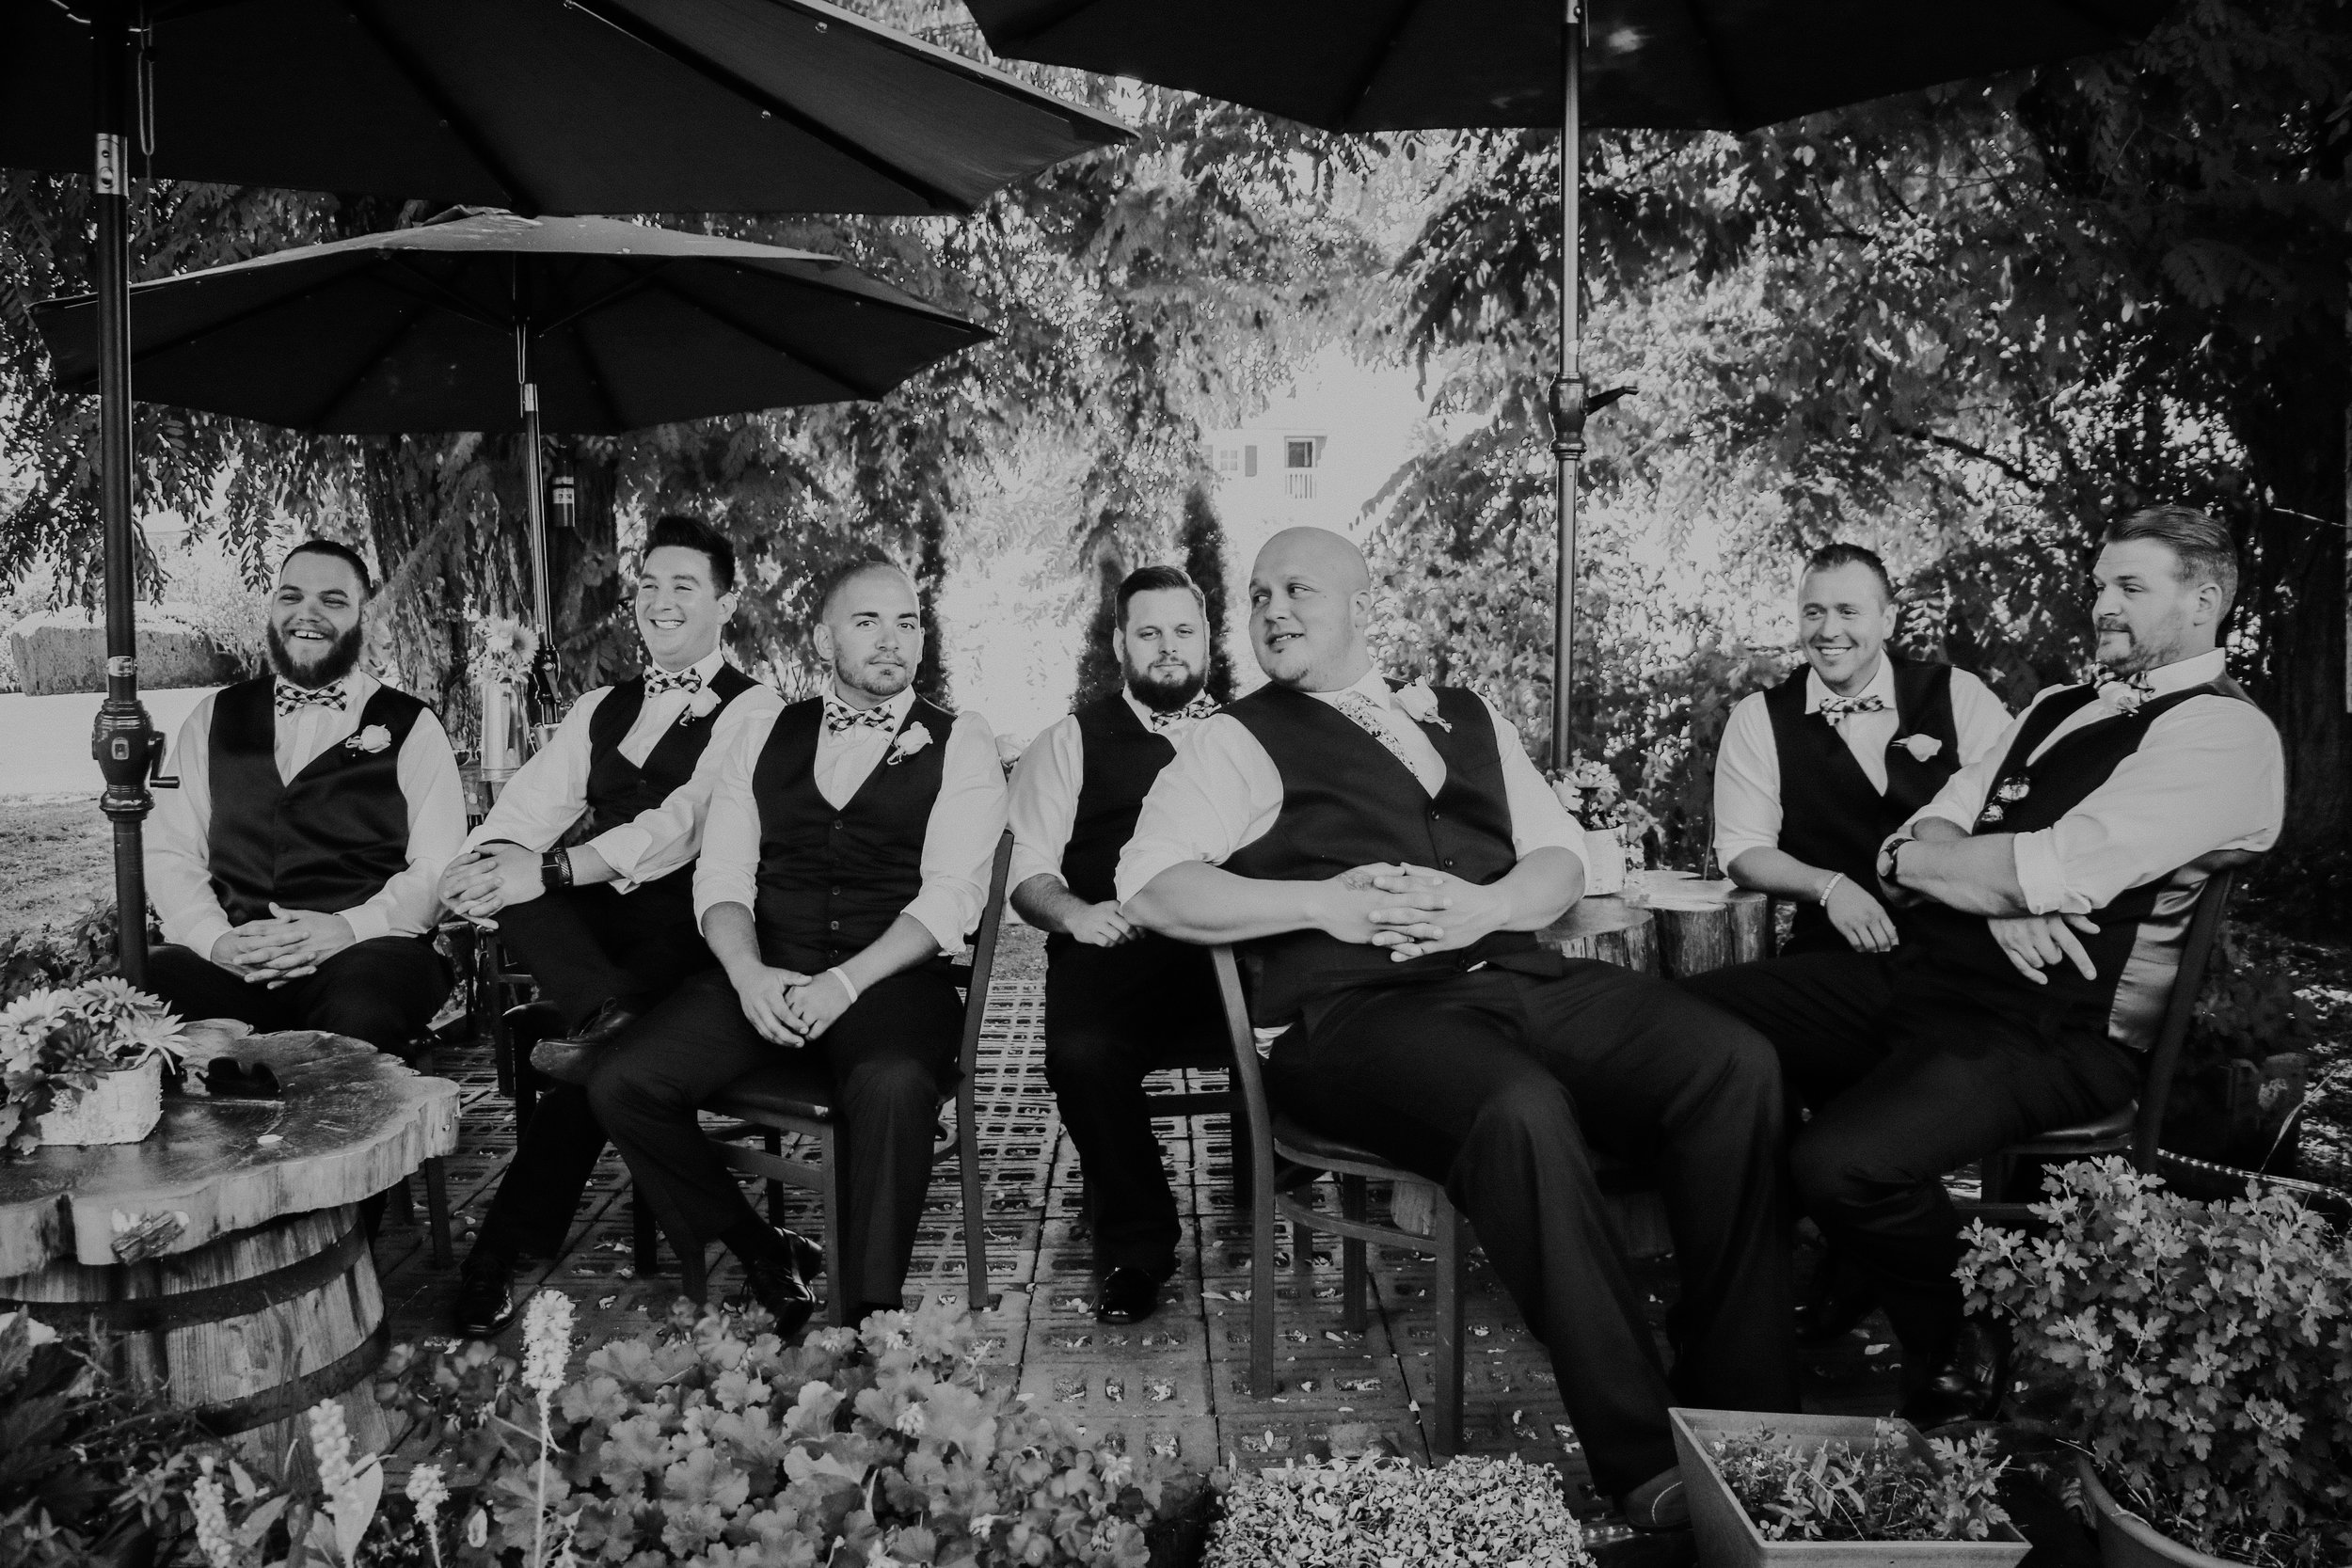 Doyle_Wedding Party Formals_007.jpg